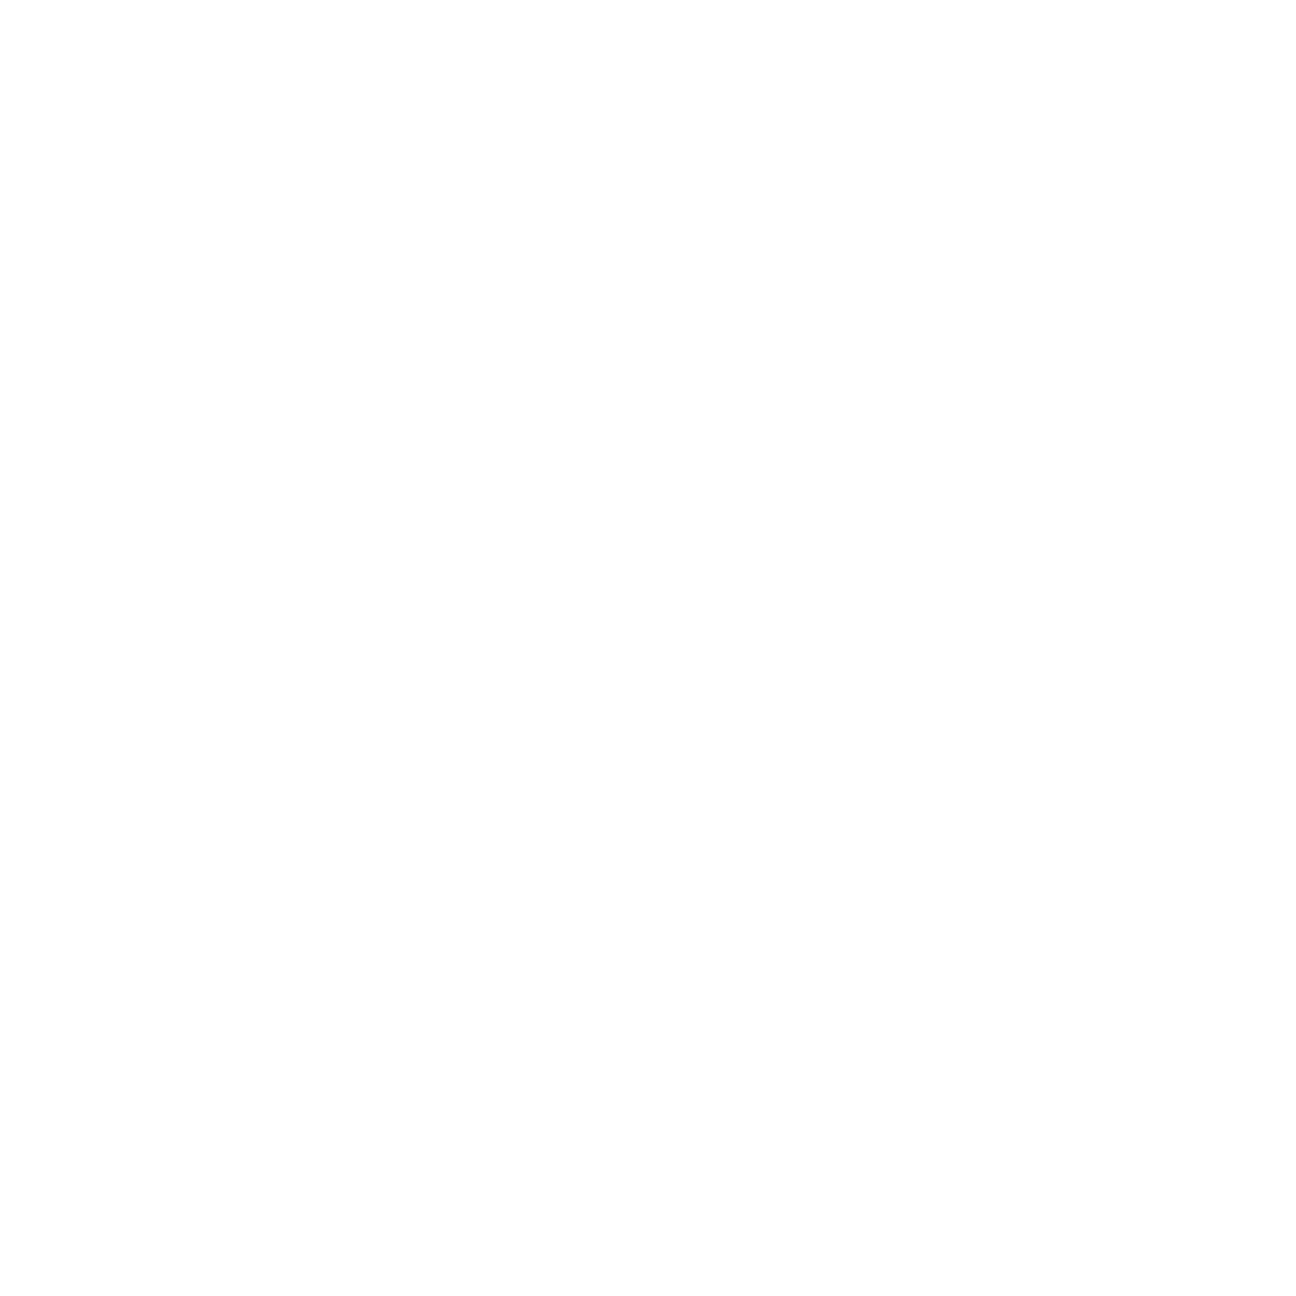 DOCNYC18Laurels_KO-officialselection.png